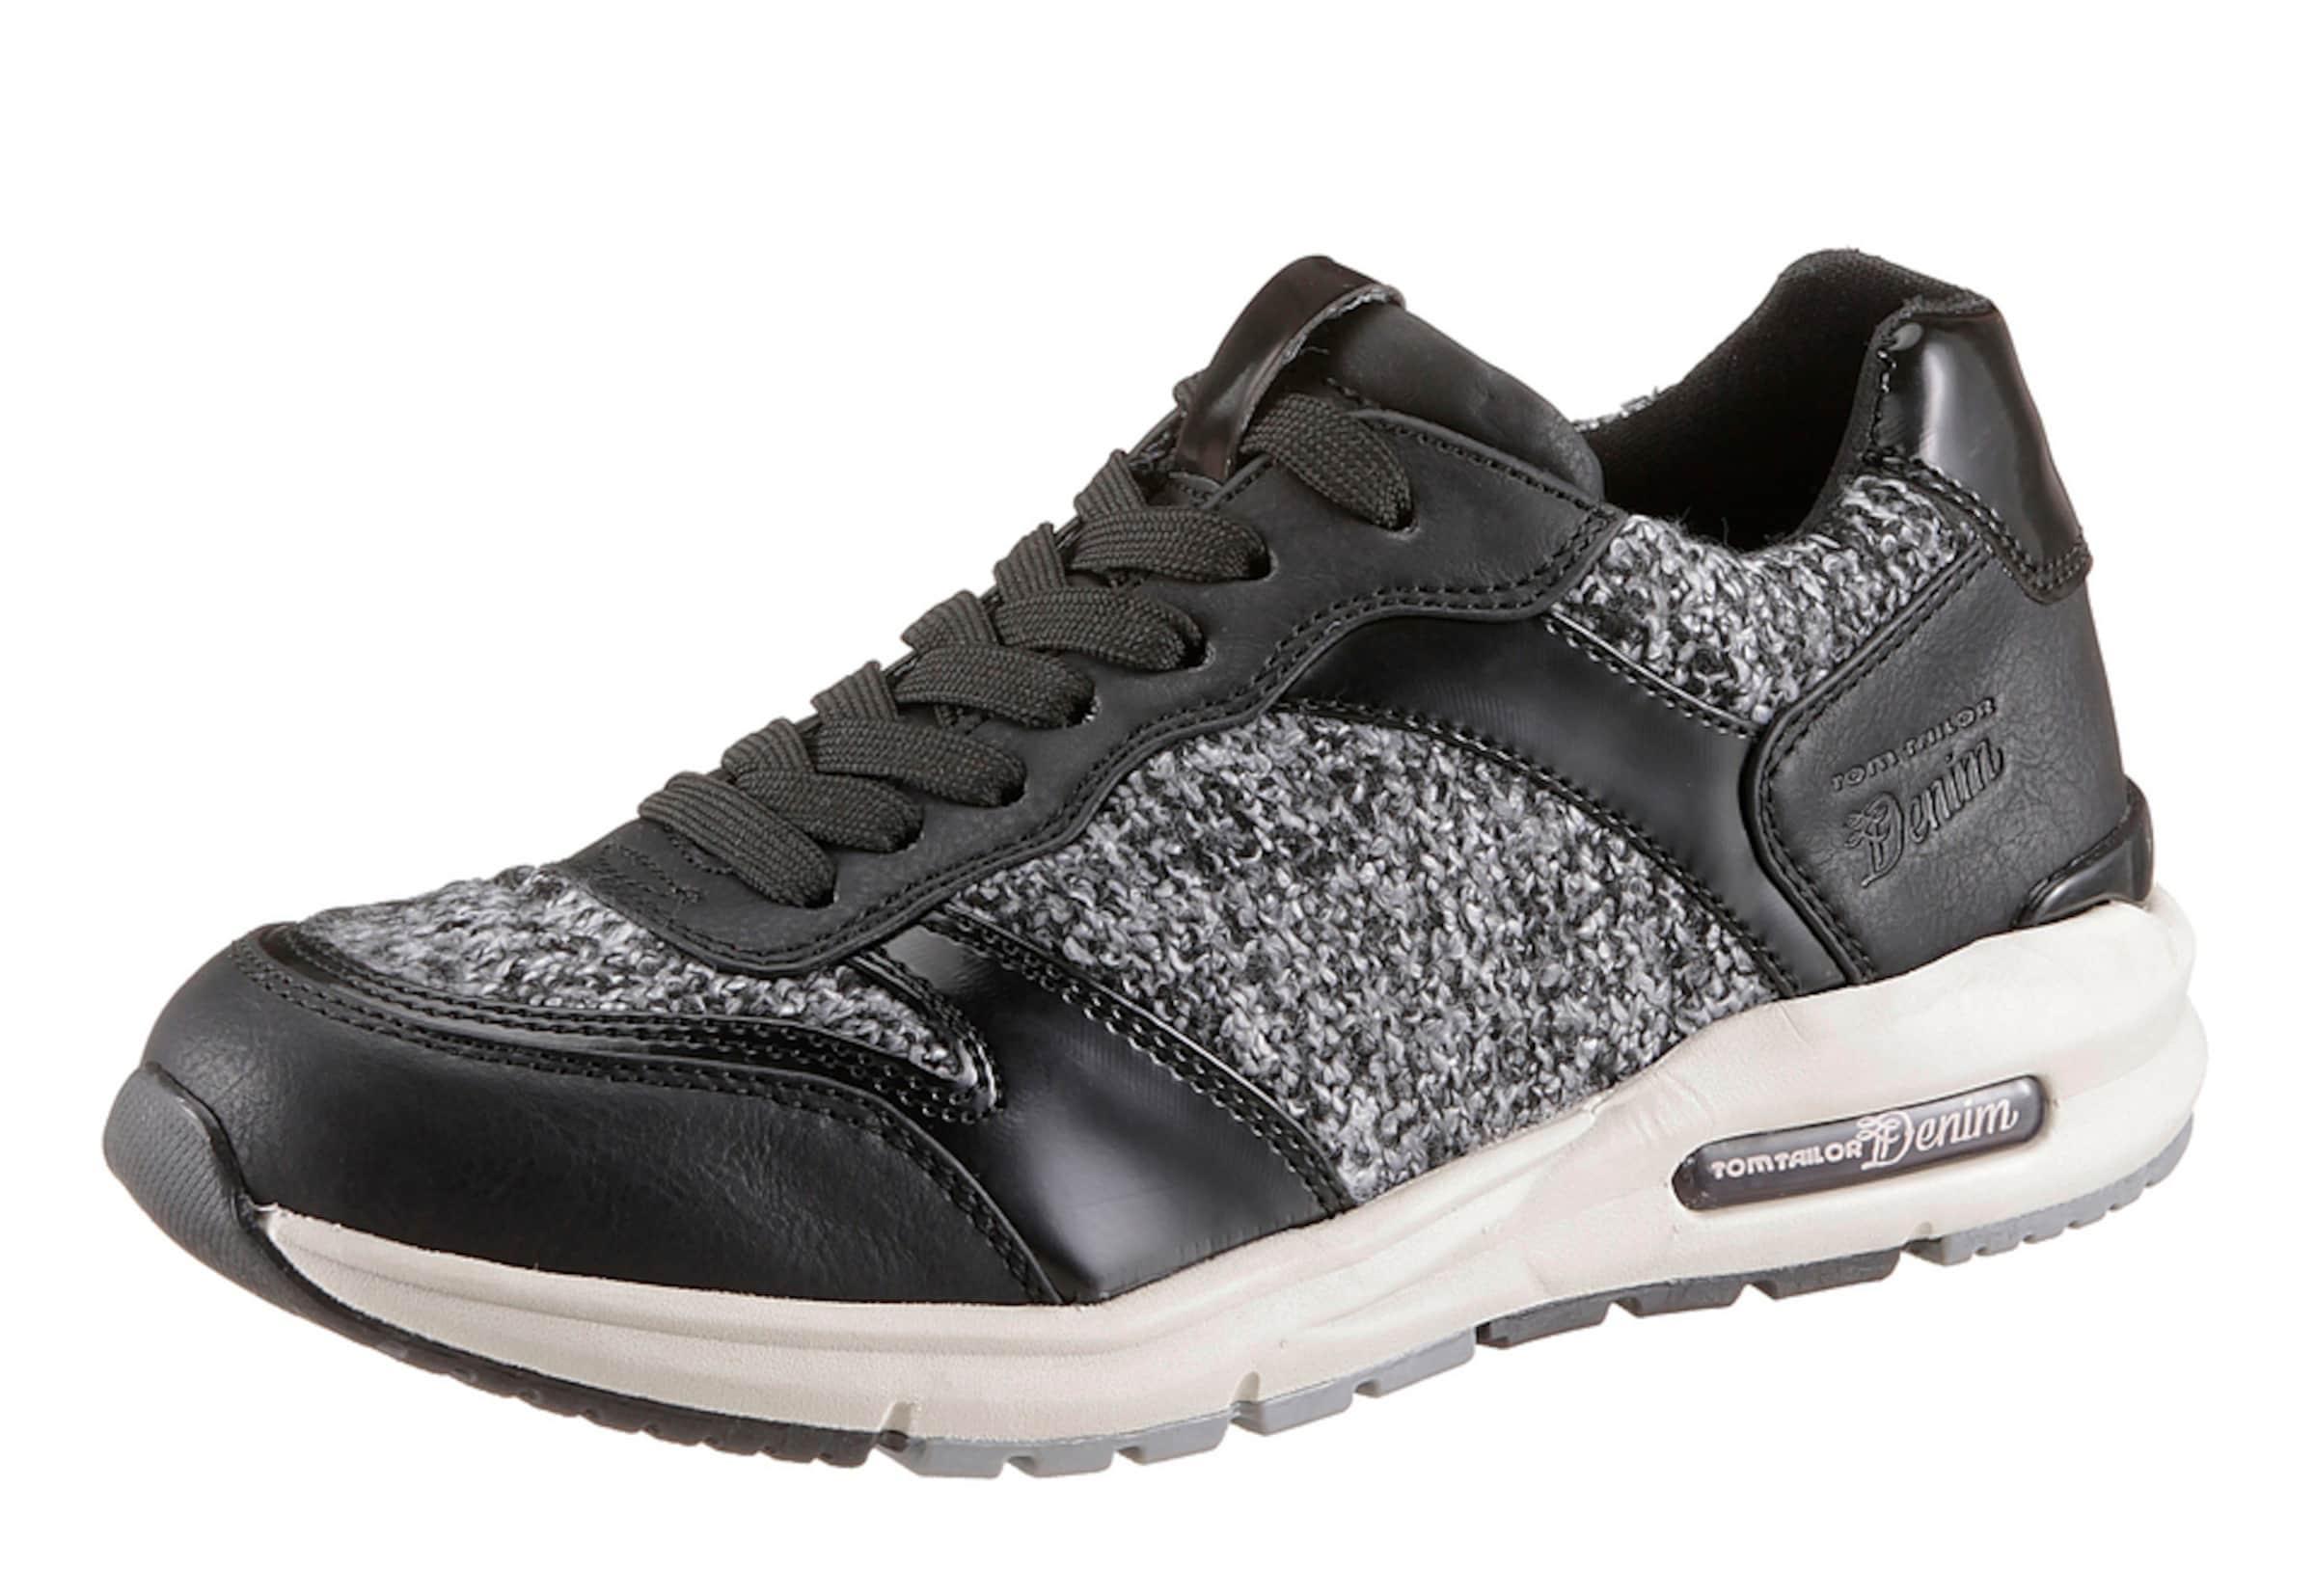 Verkauf Truhe Bilder TOM TAILOR Sneaker Günstig Kaufen Erschwinglich km9mVU54a3